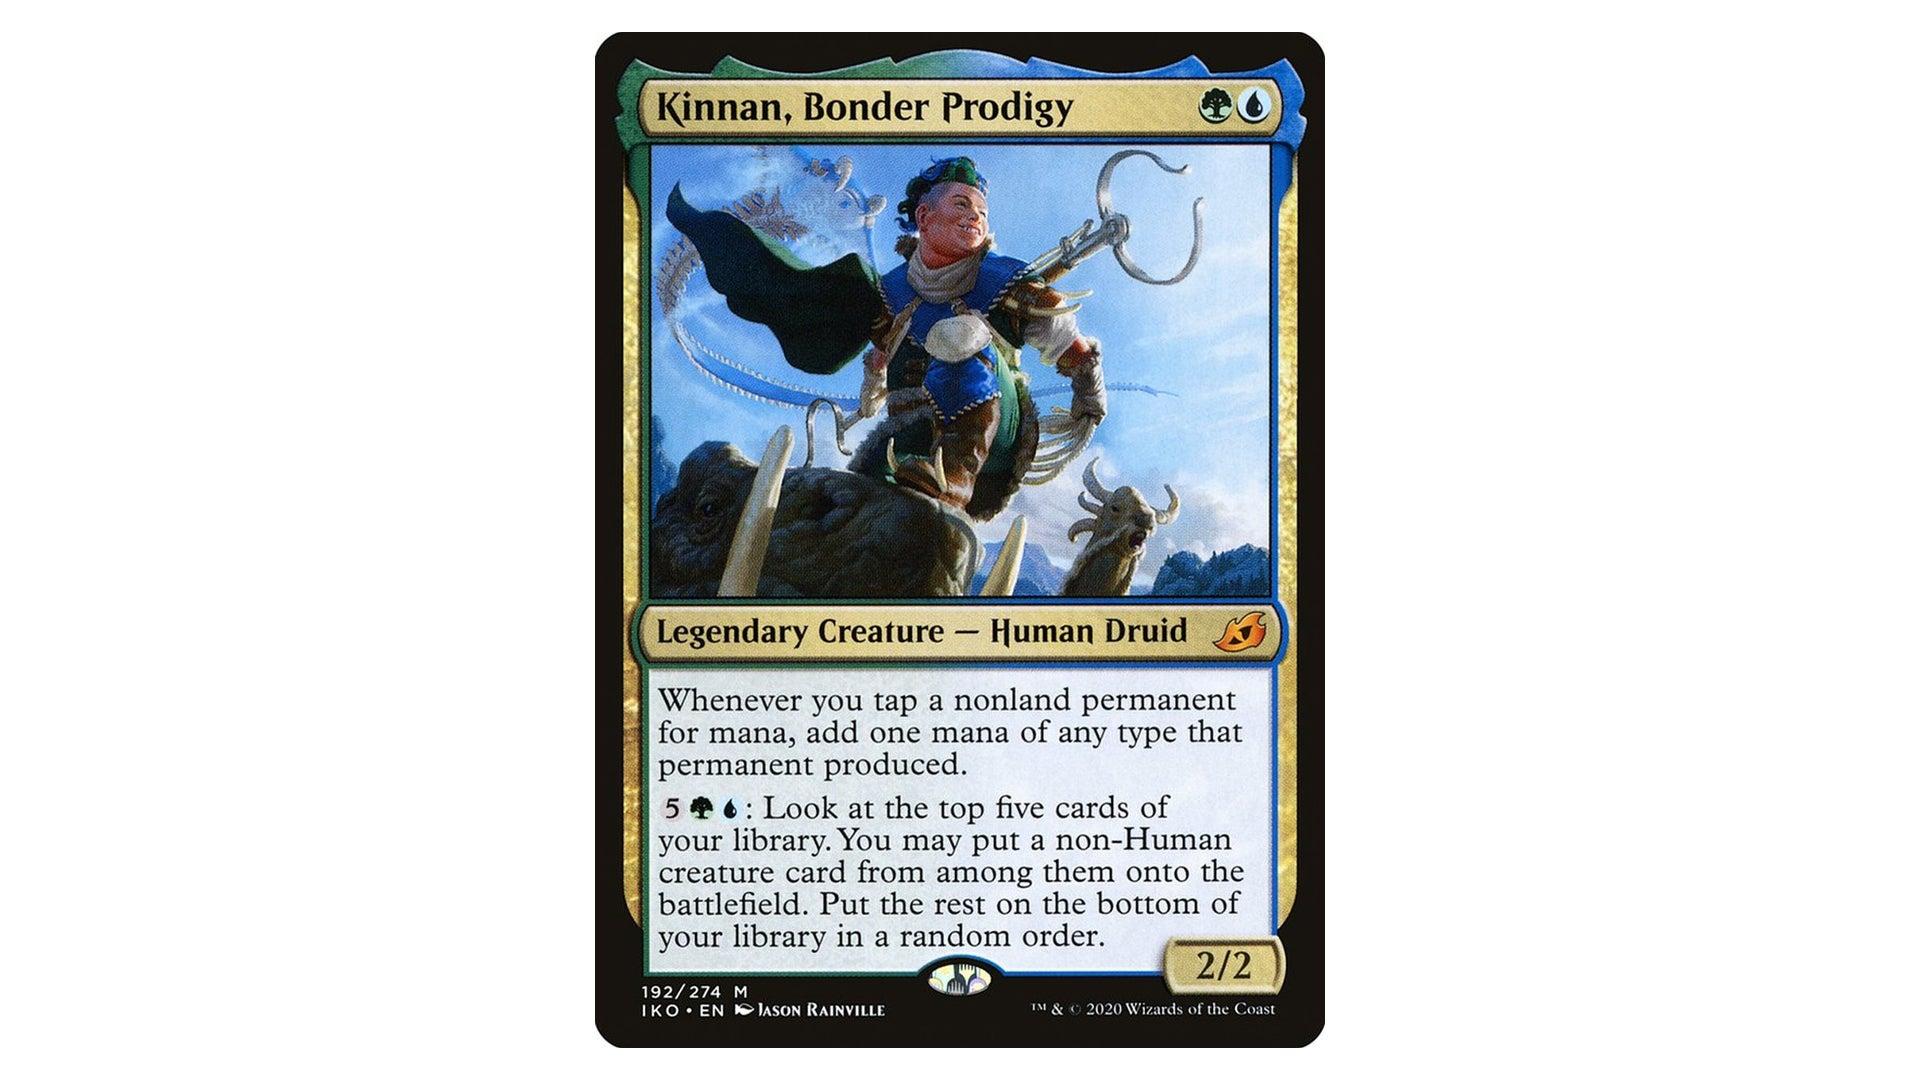 mtg-card-kinnan-bonder-prodigy.jpg